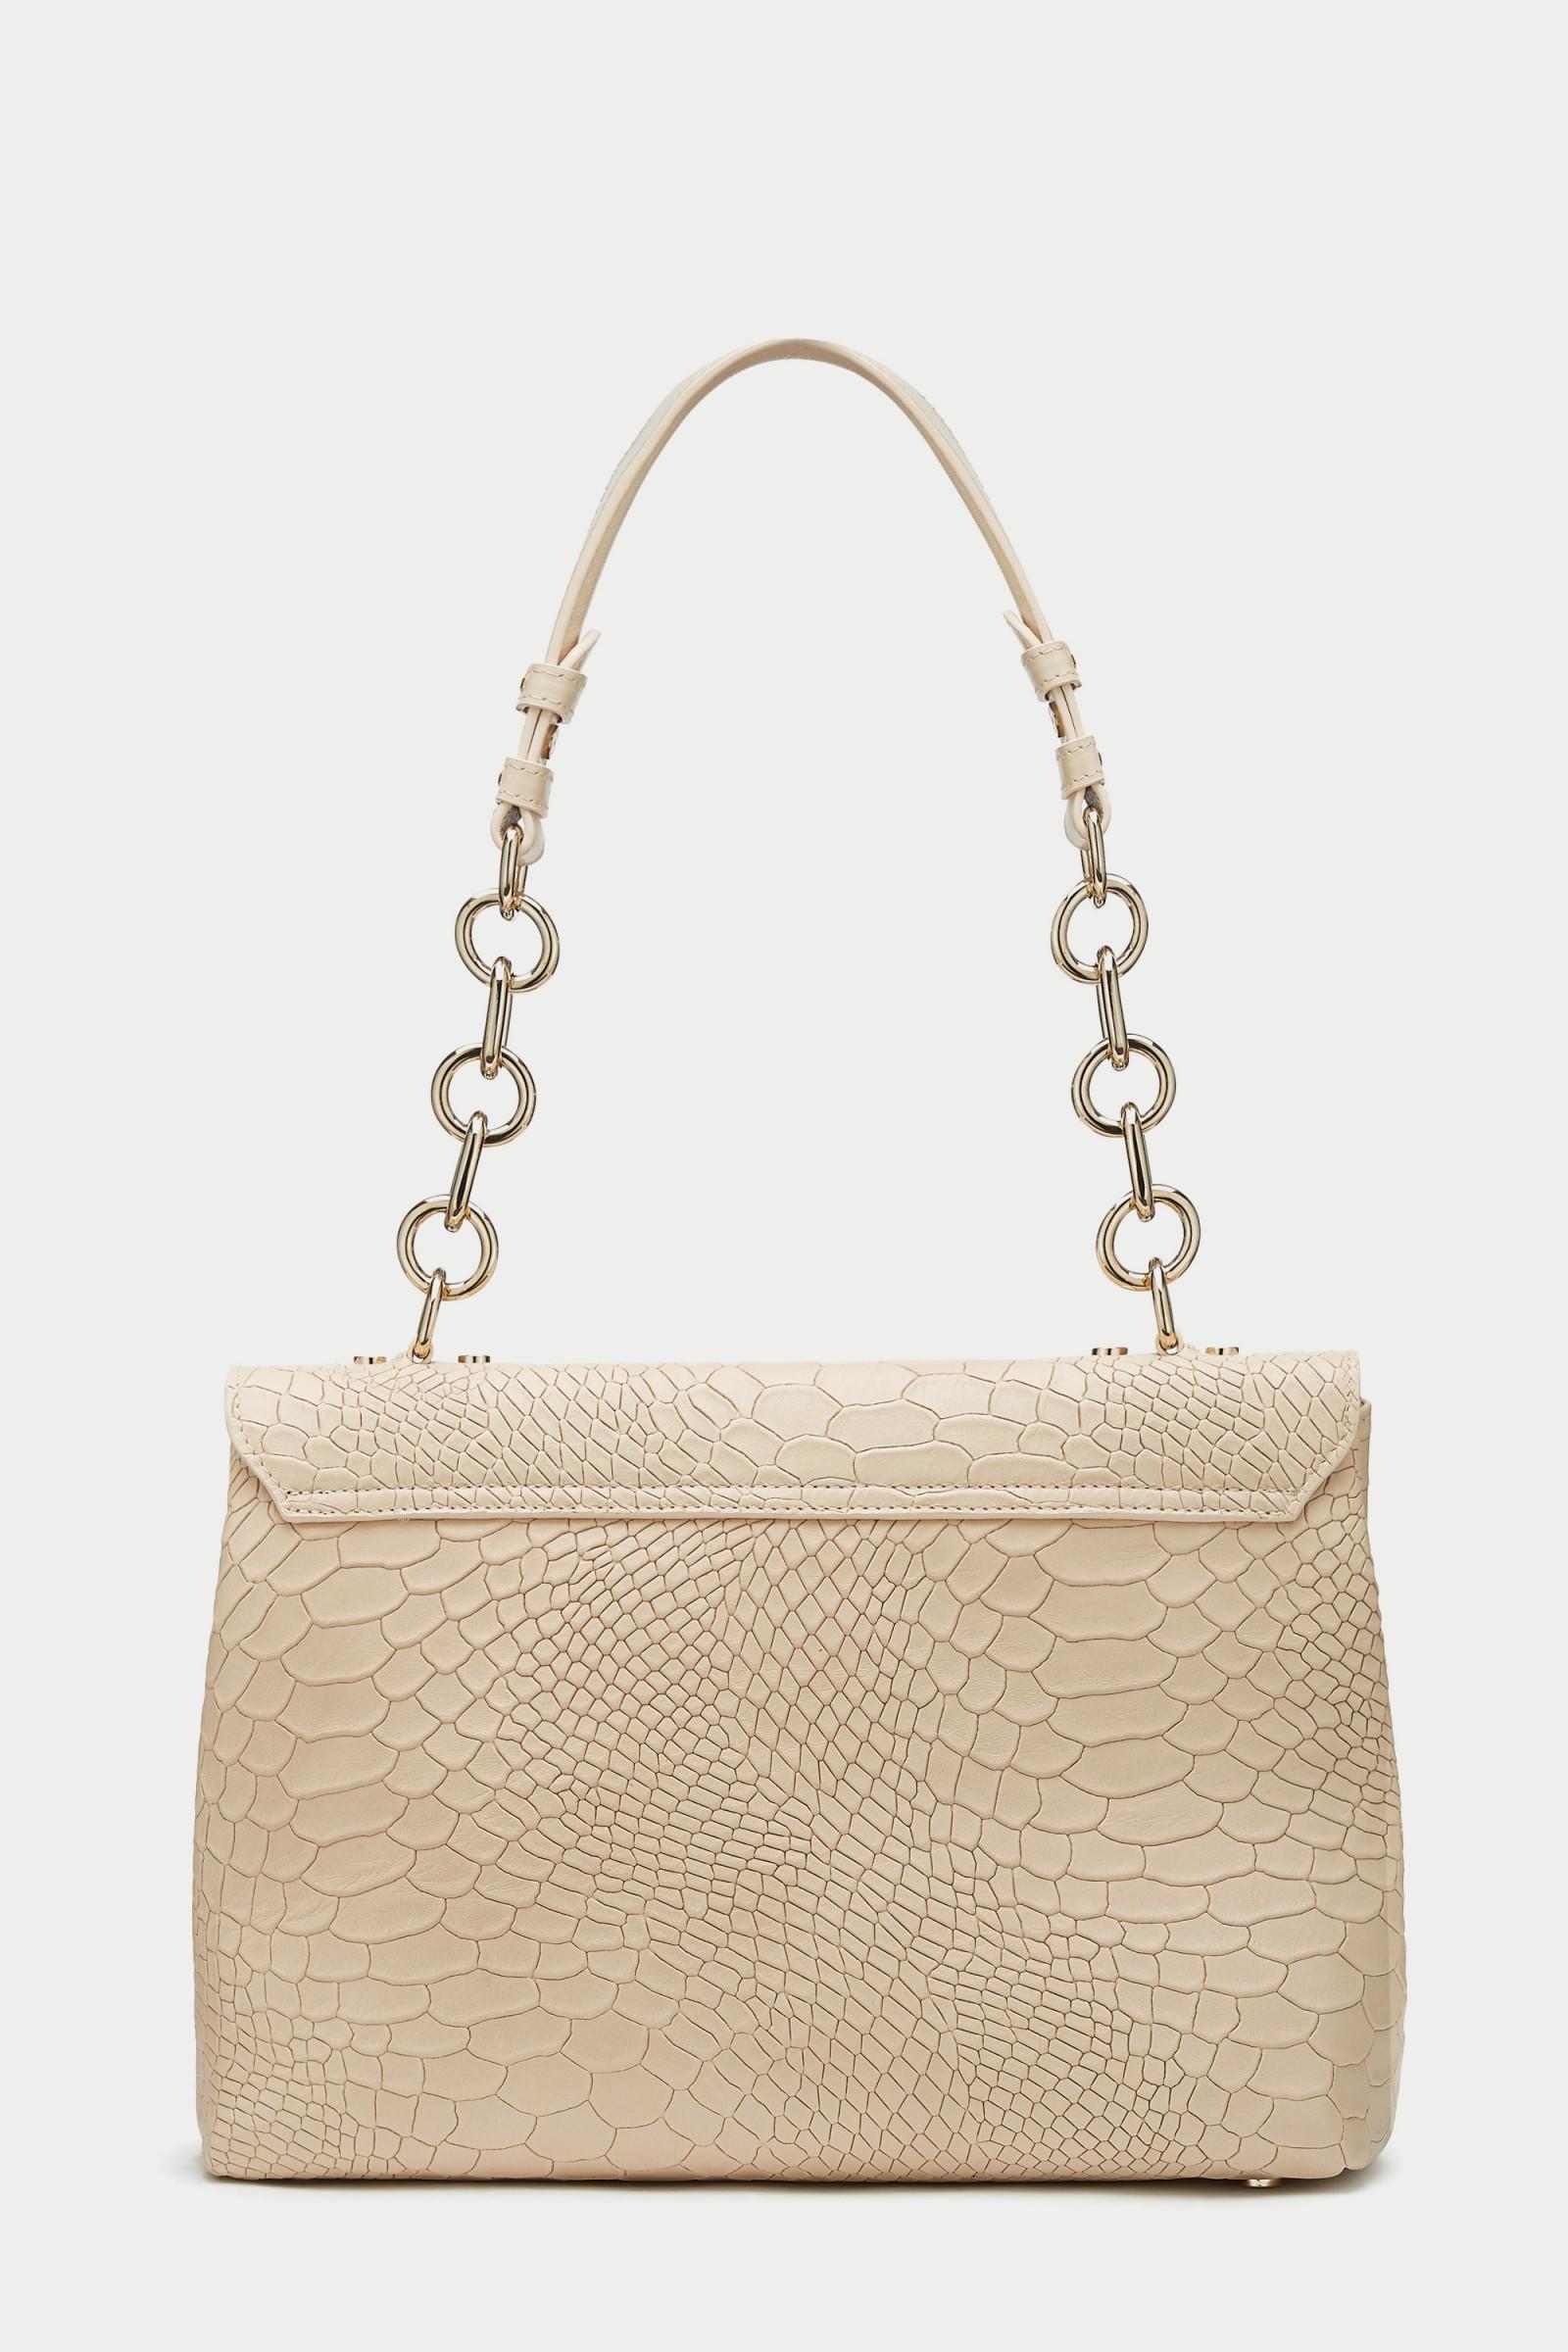 7c839bc5616 ... ccb7003 designer handbags by Caroline Castigliano · Briella ANACONDA  ROSA Pink Leather Handbag